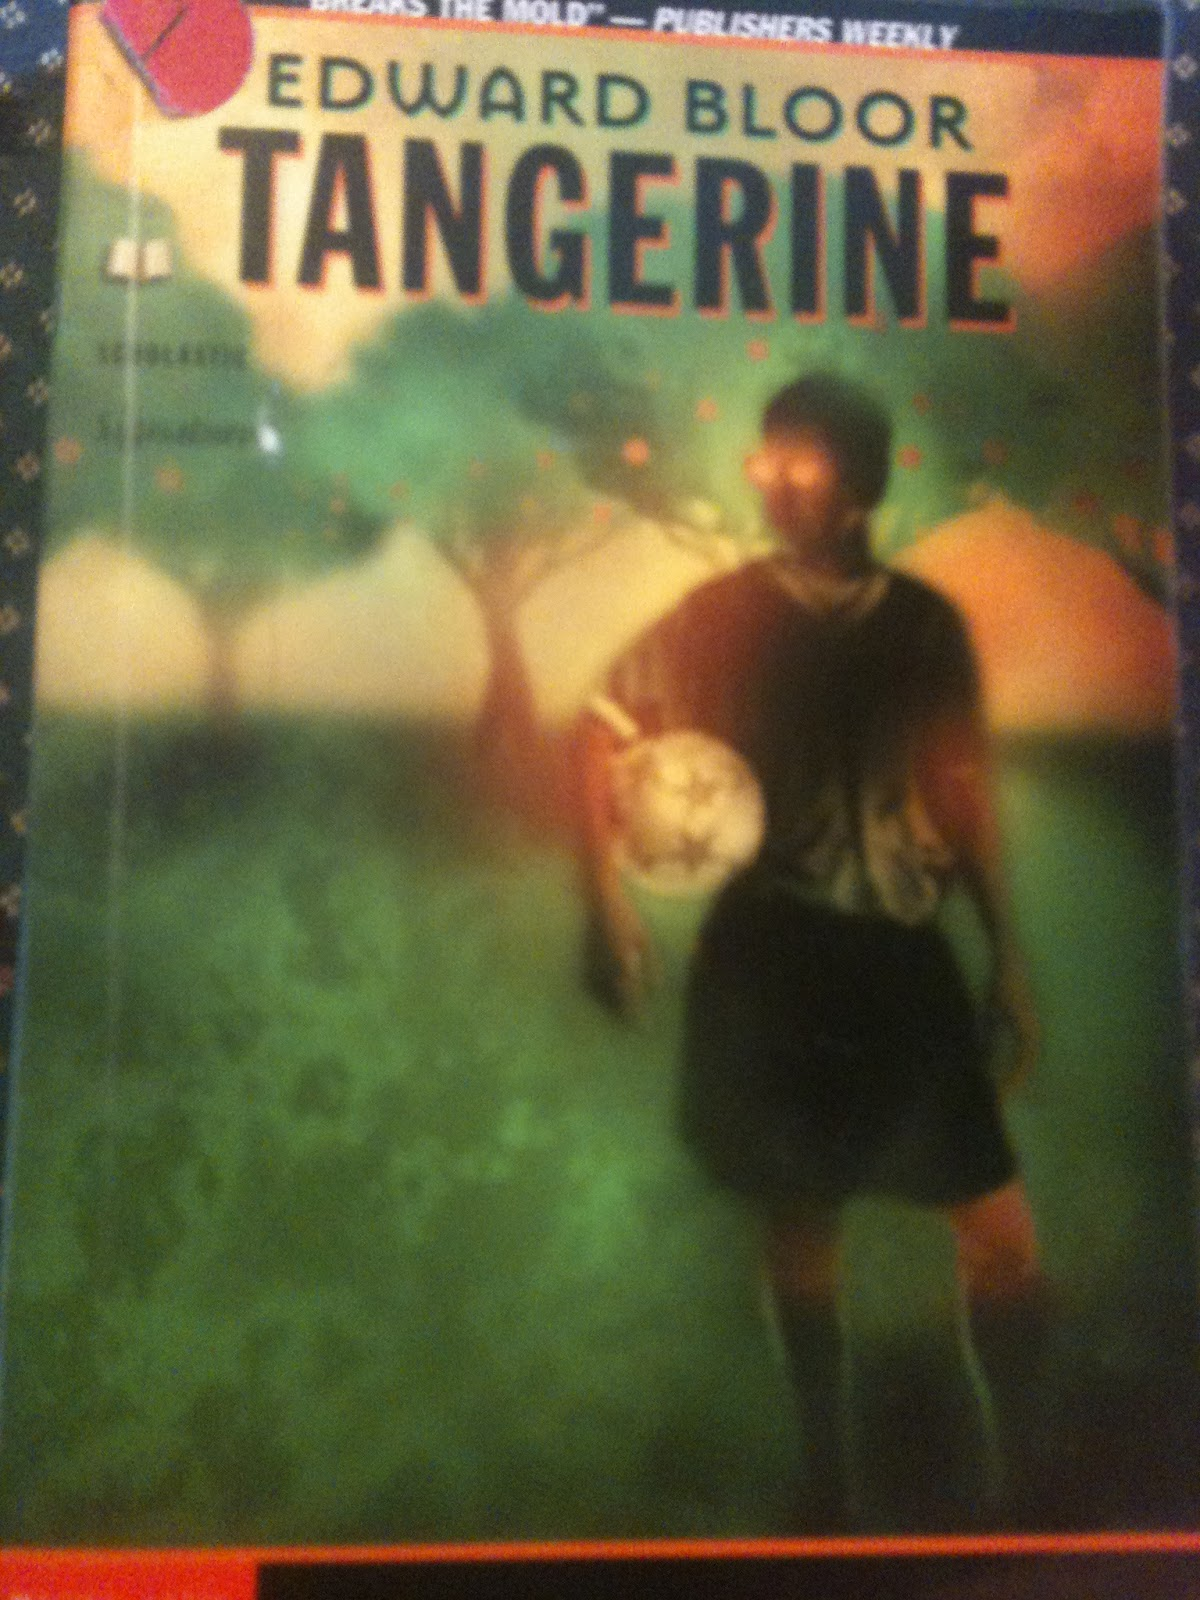 tangerine by edward bloor essay